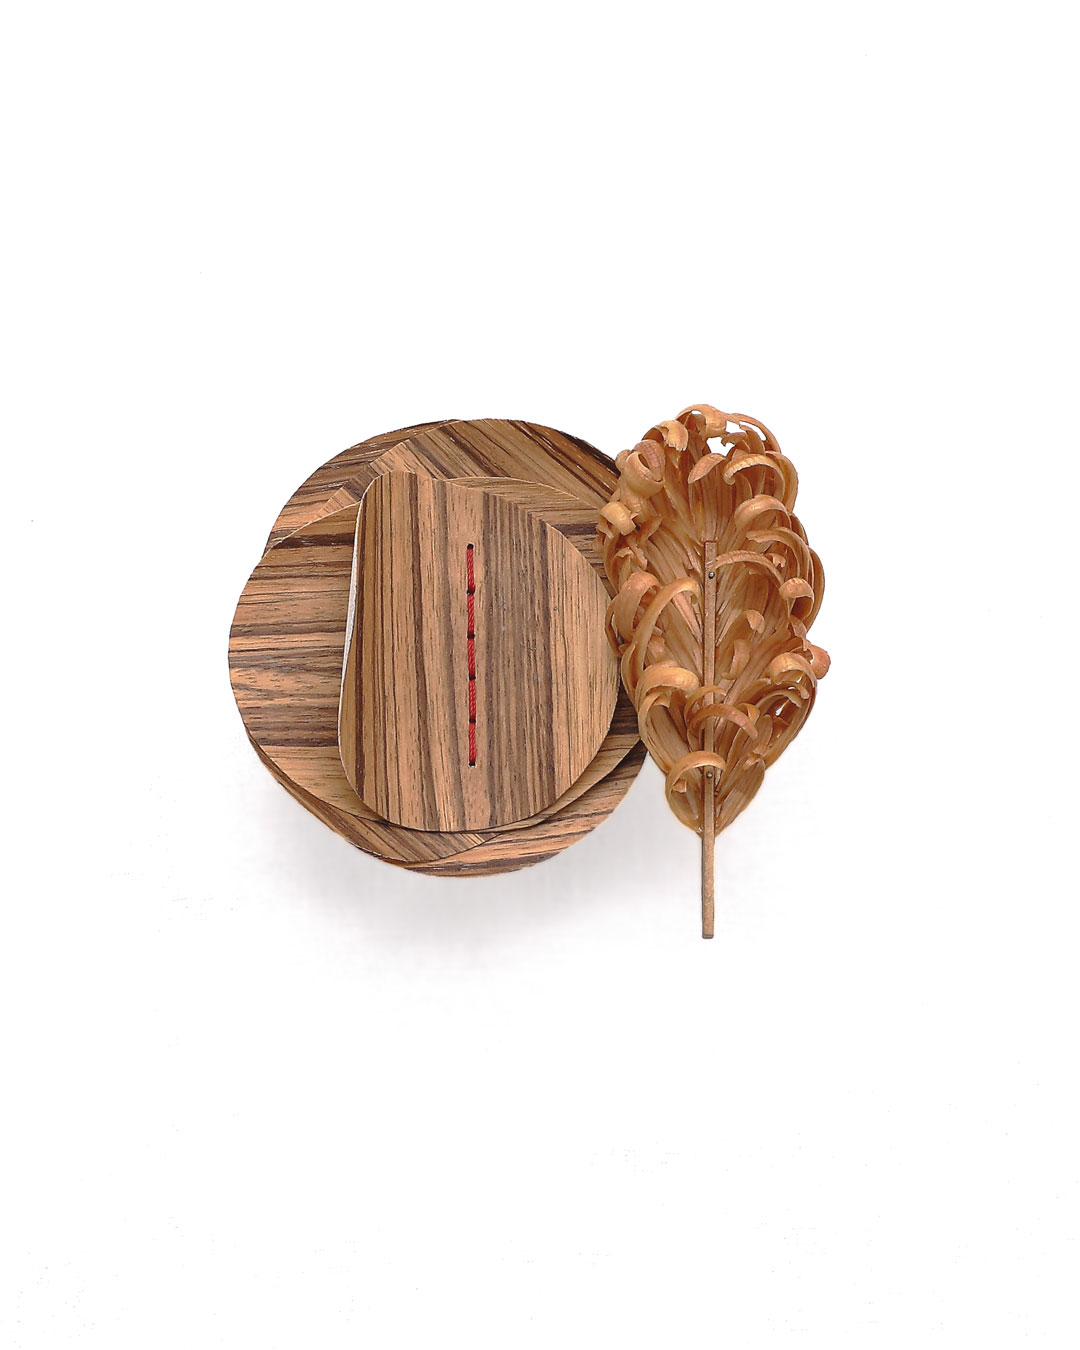 Dongchun Lee, Flourish Wither, 2014, brooch; wood, nylon thread, galvanised steel, nickel silver, 135 x 120 x 35 mm, €2010